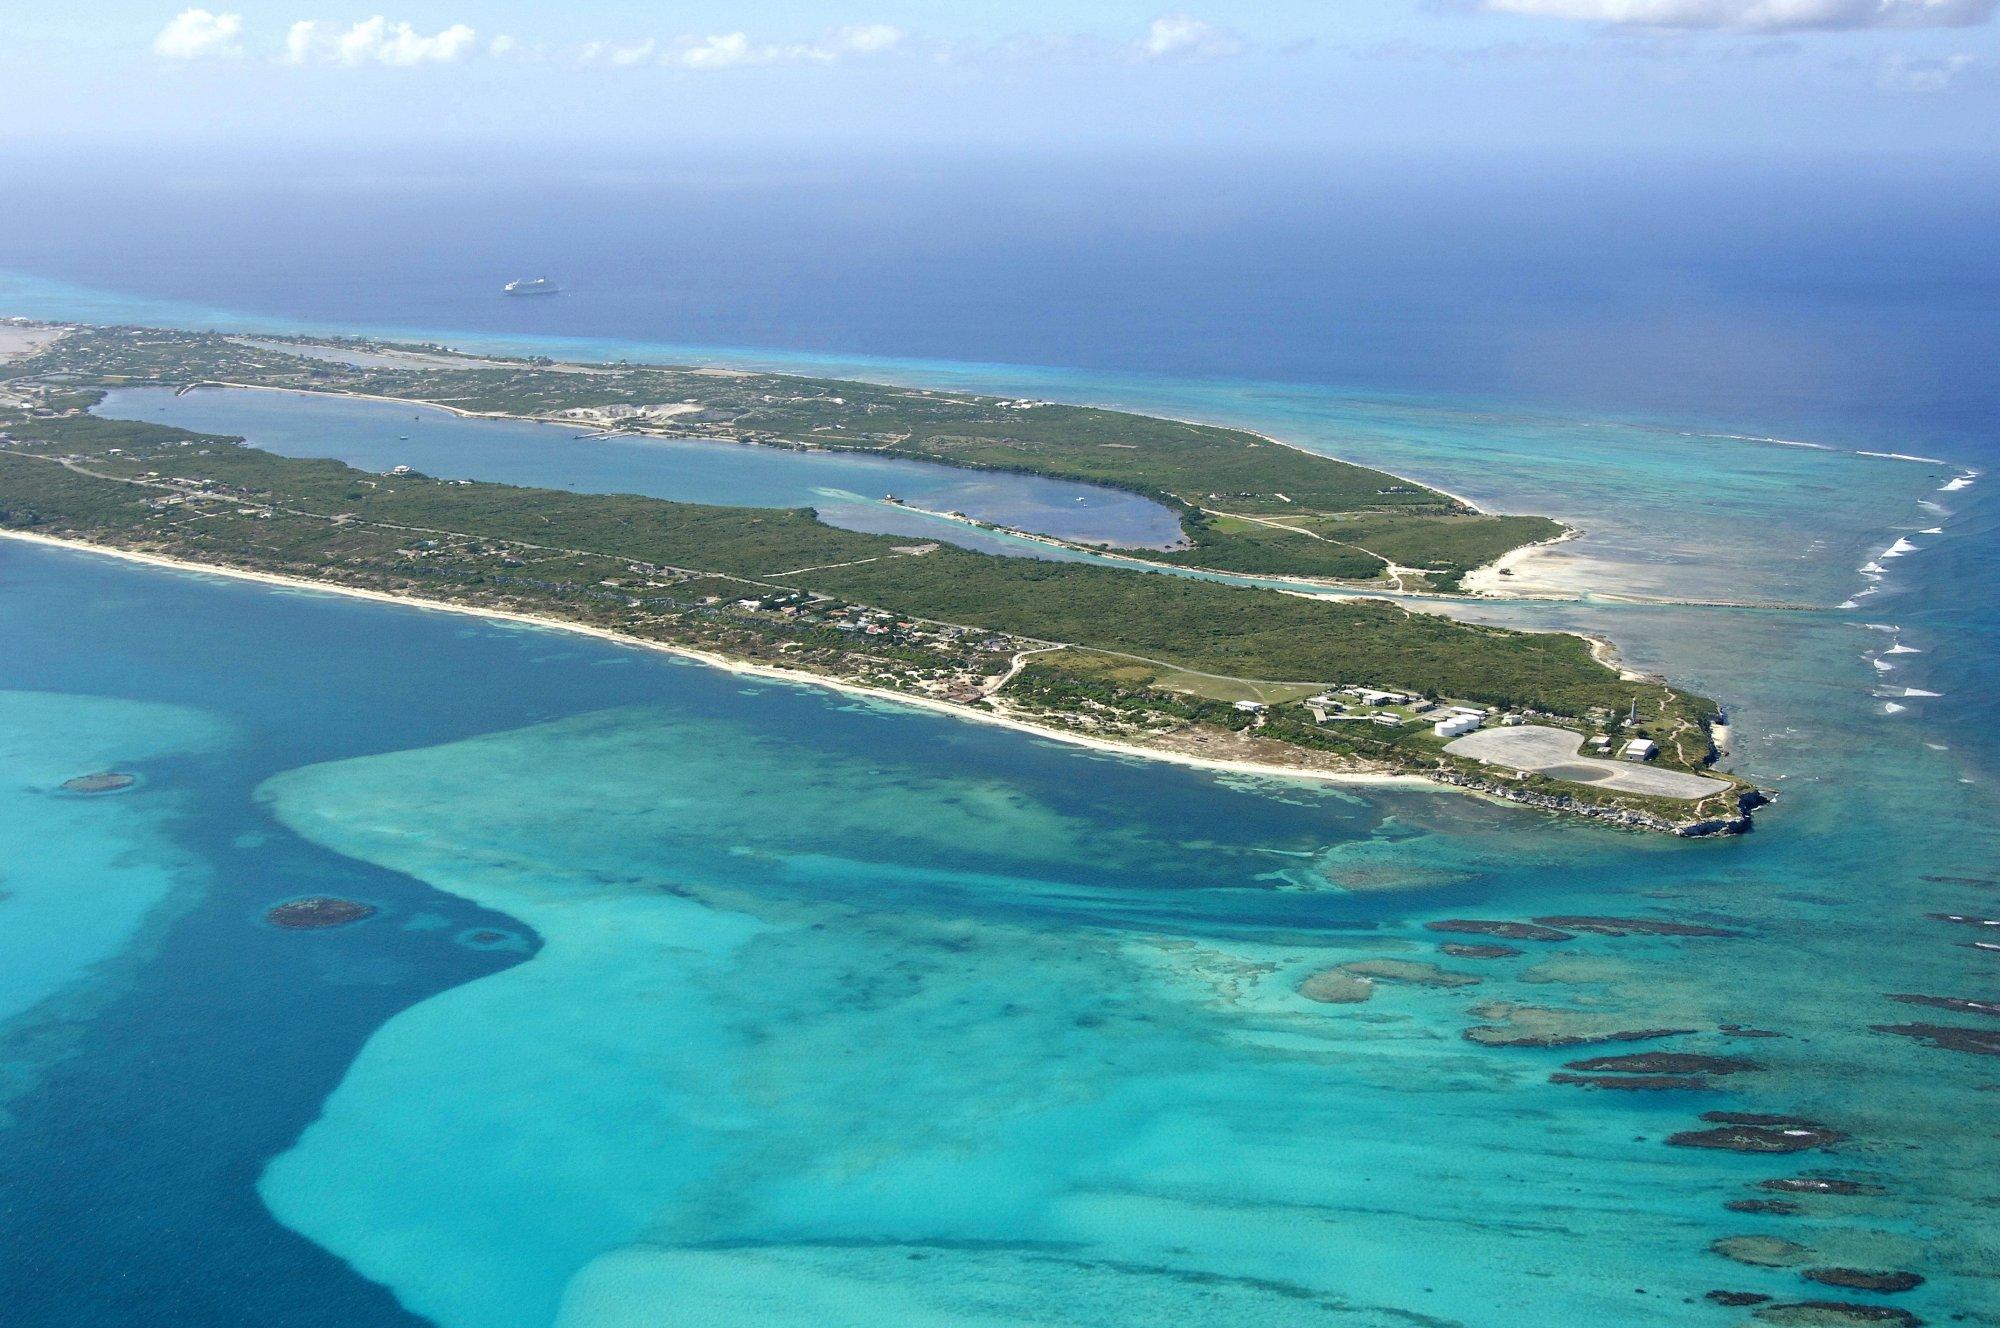 Turks & Caicos - April 2019